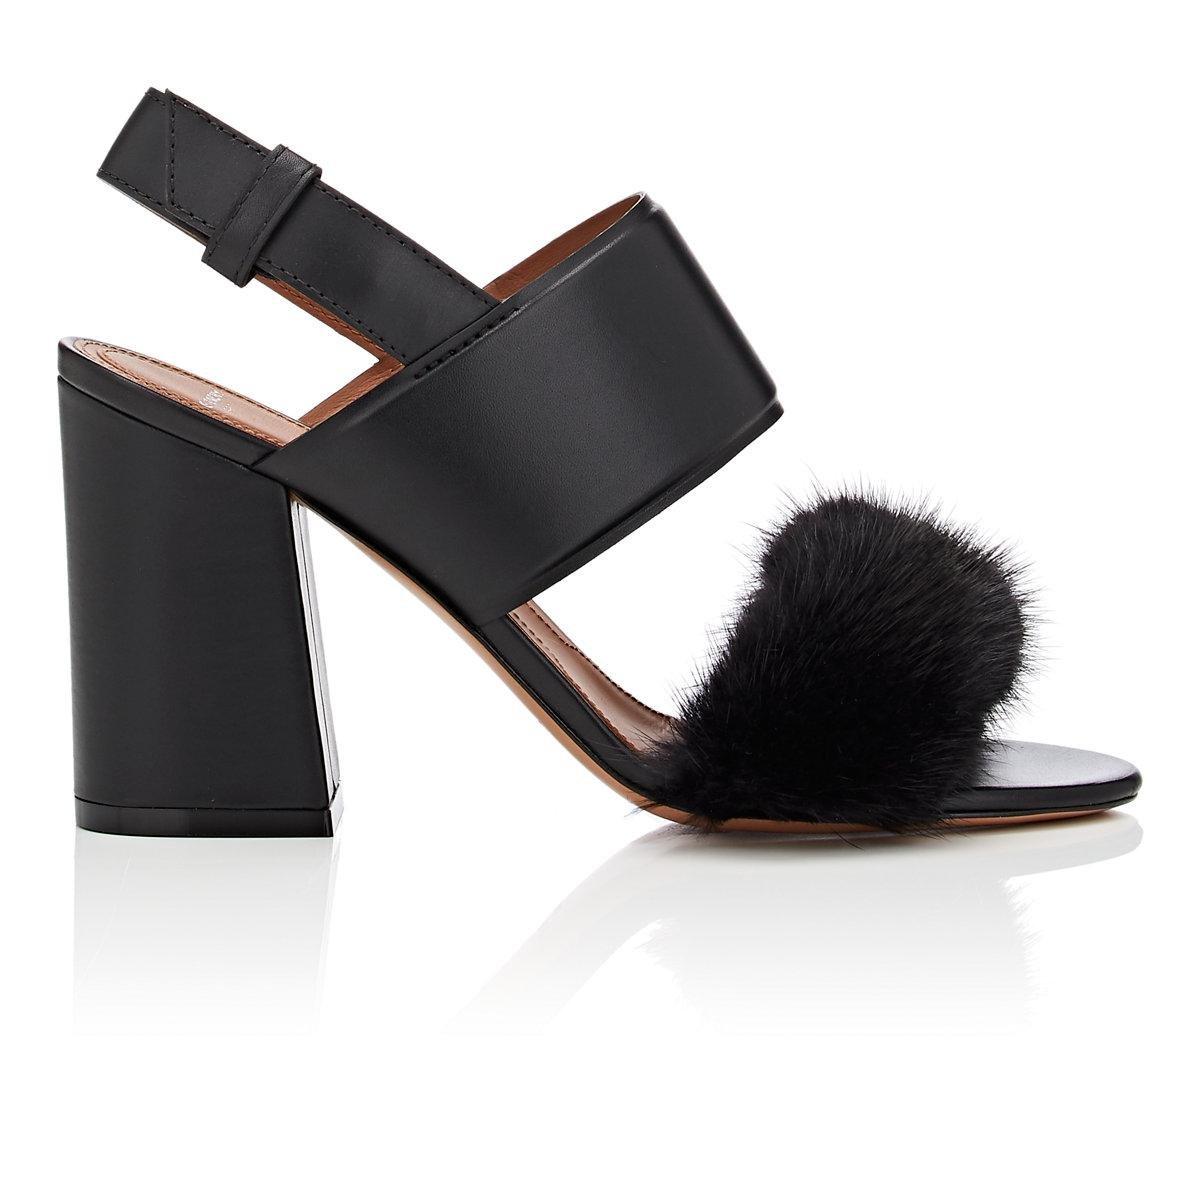 Sandals leather black mink Givenchy catYJD